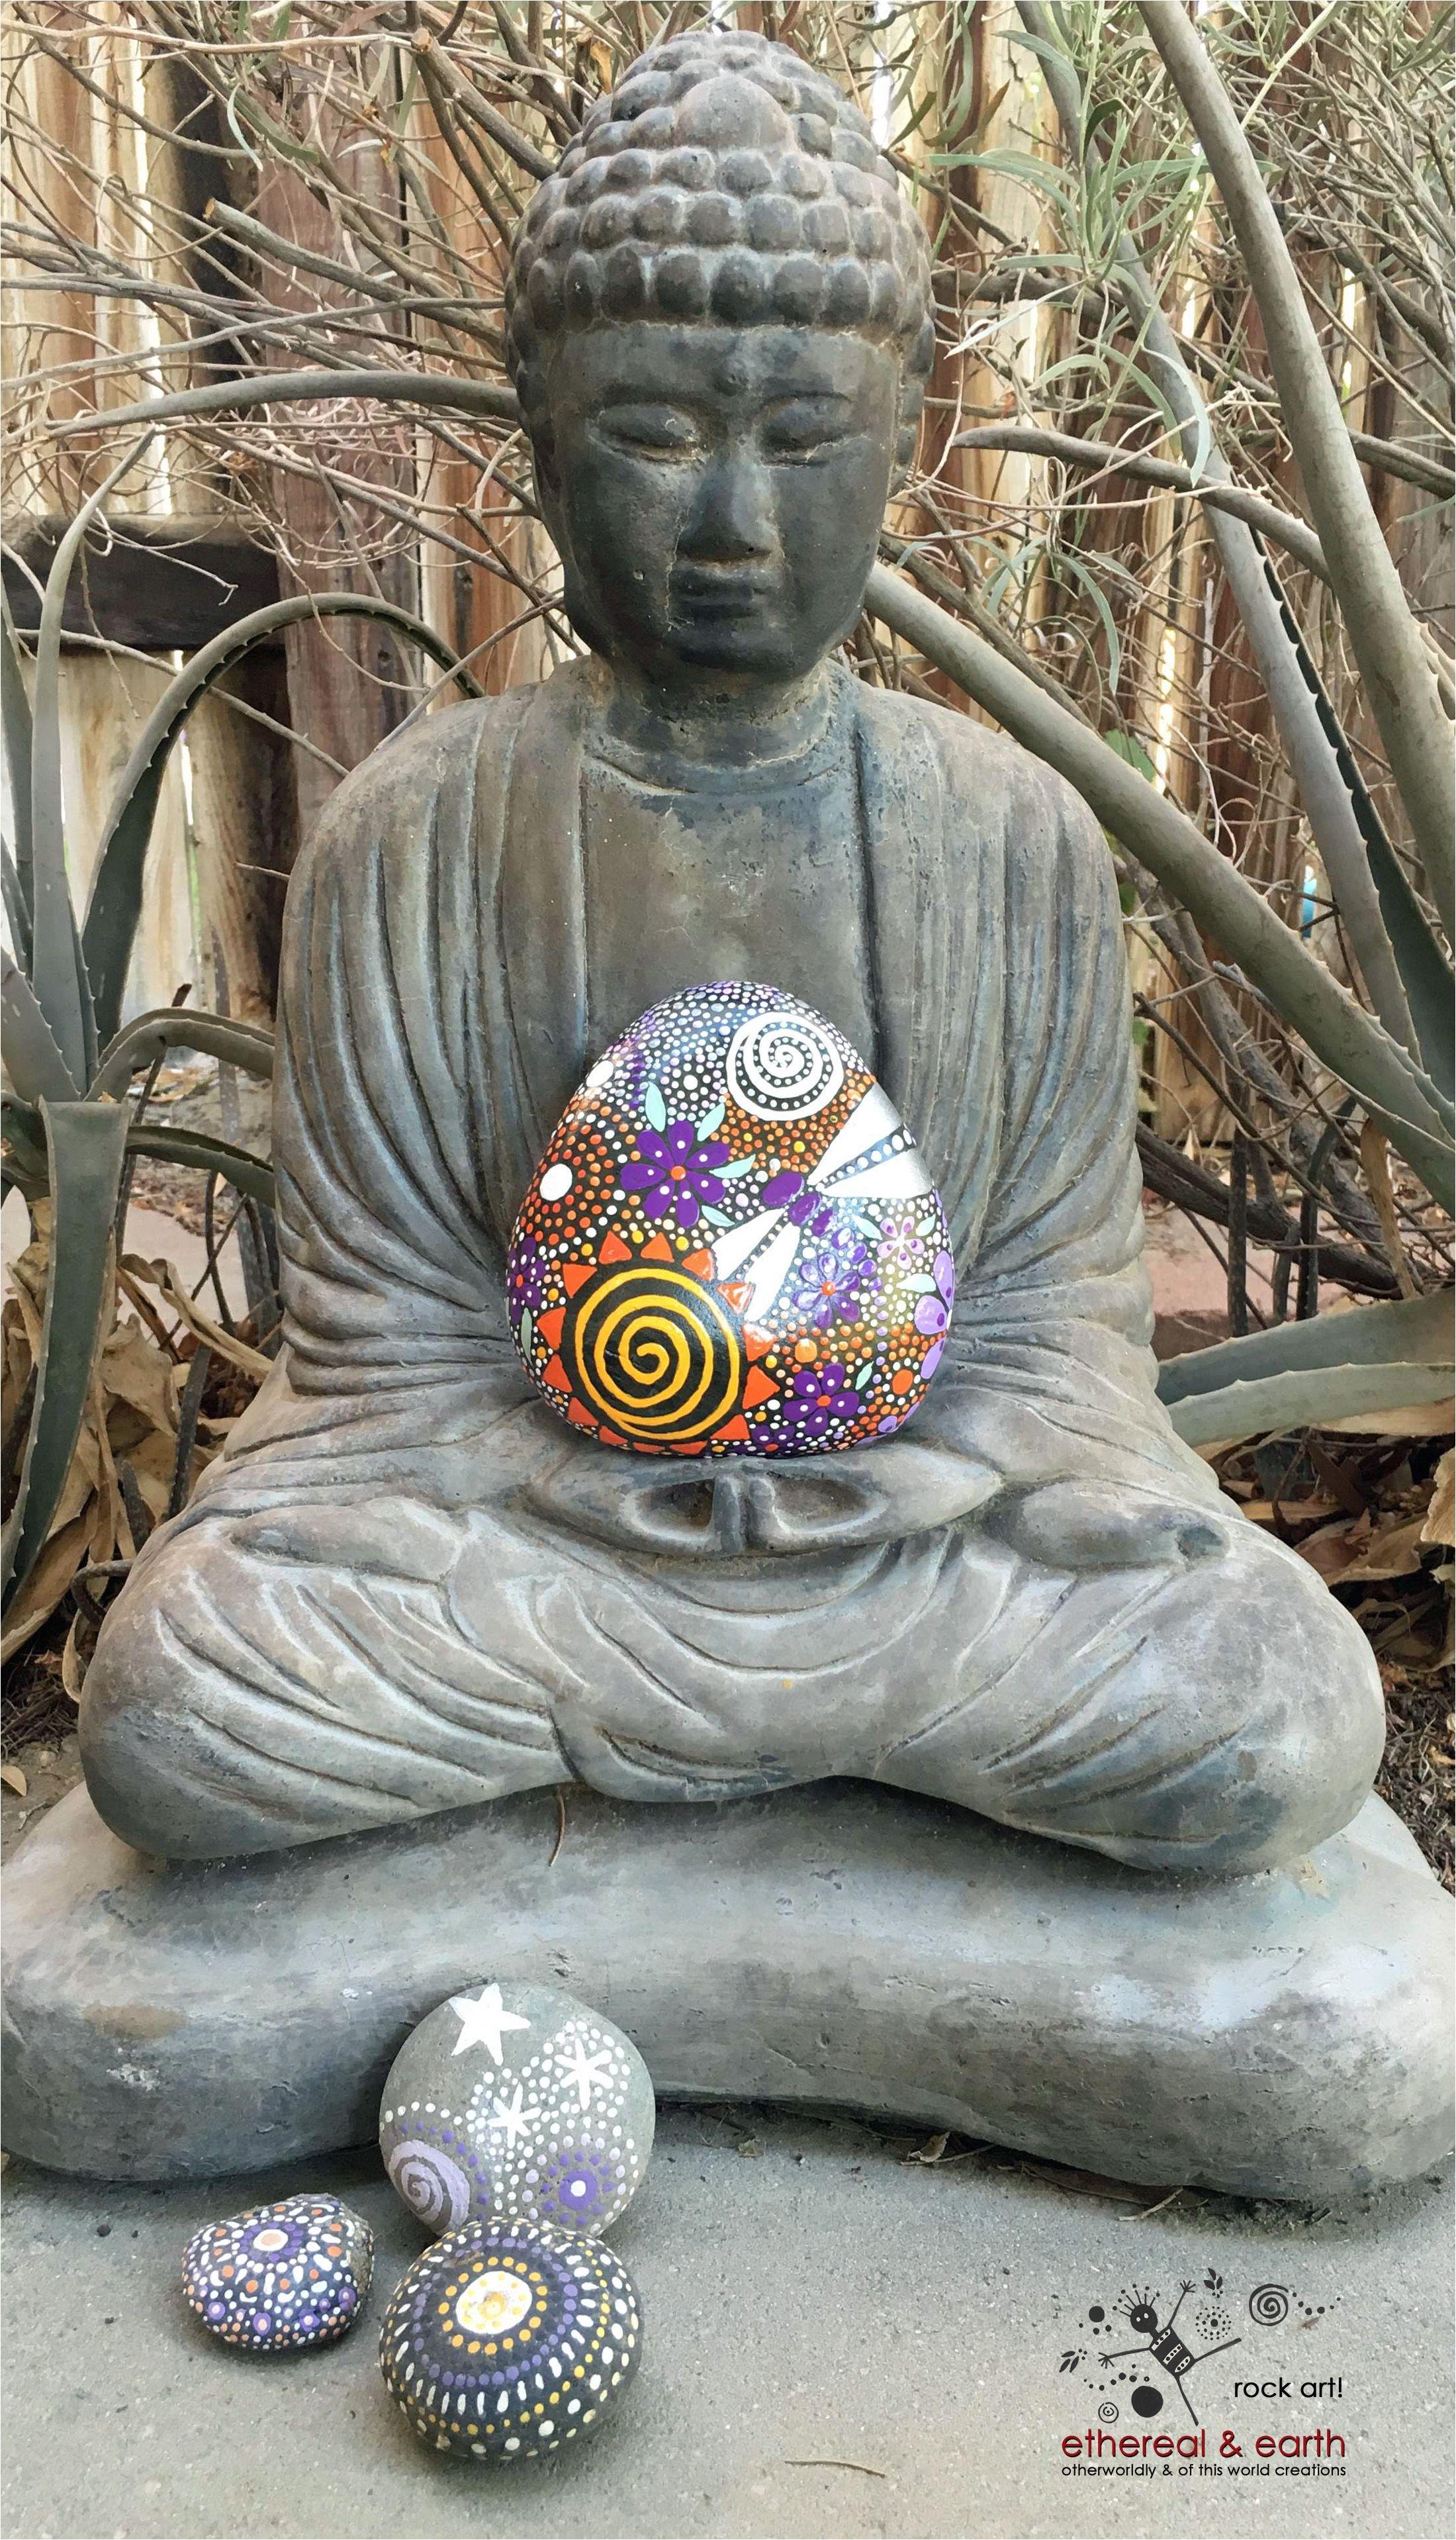 painted stone meditation space decor mandala design dragonfly art garden art